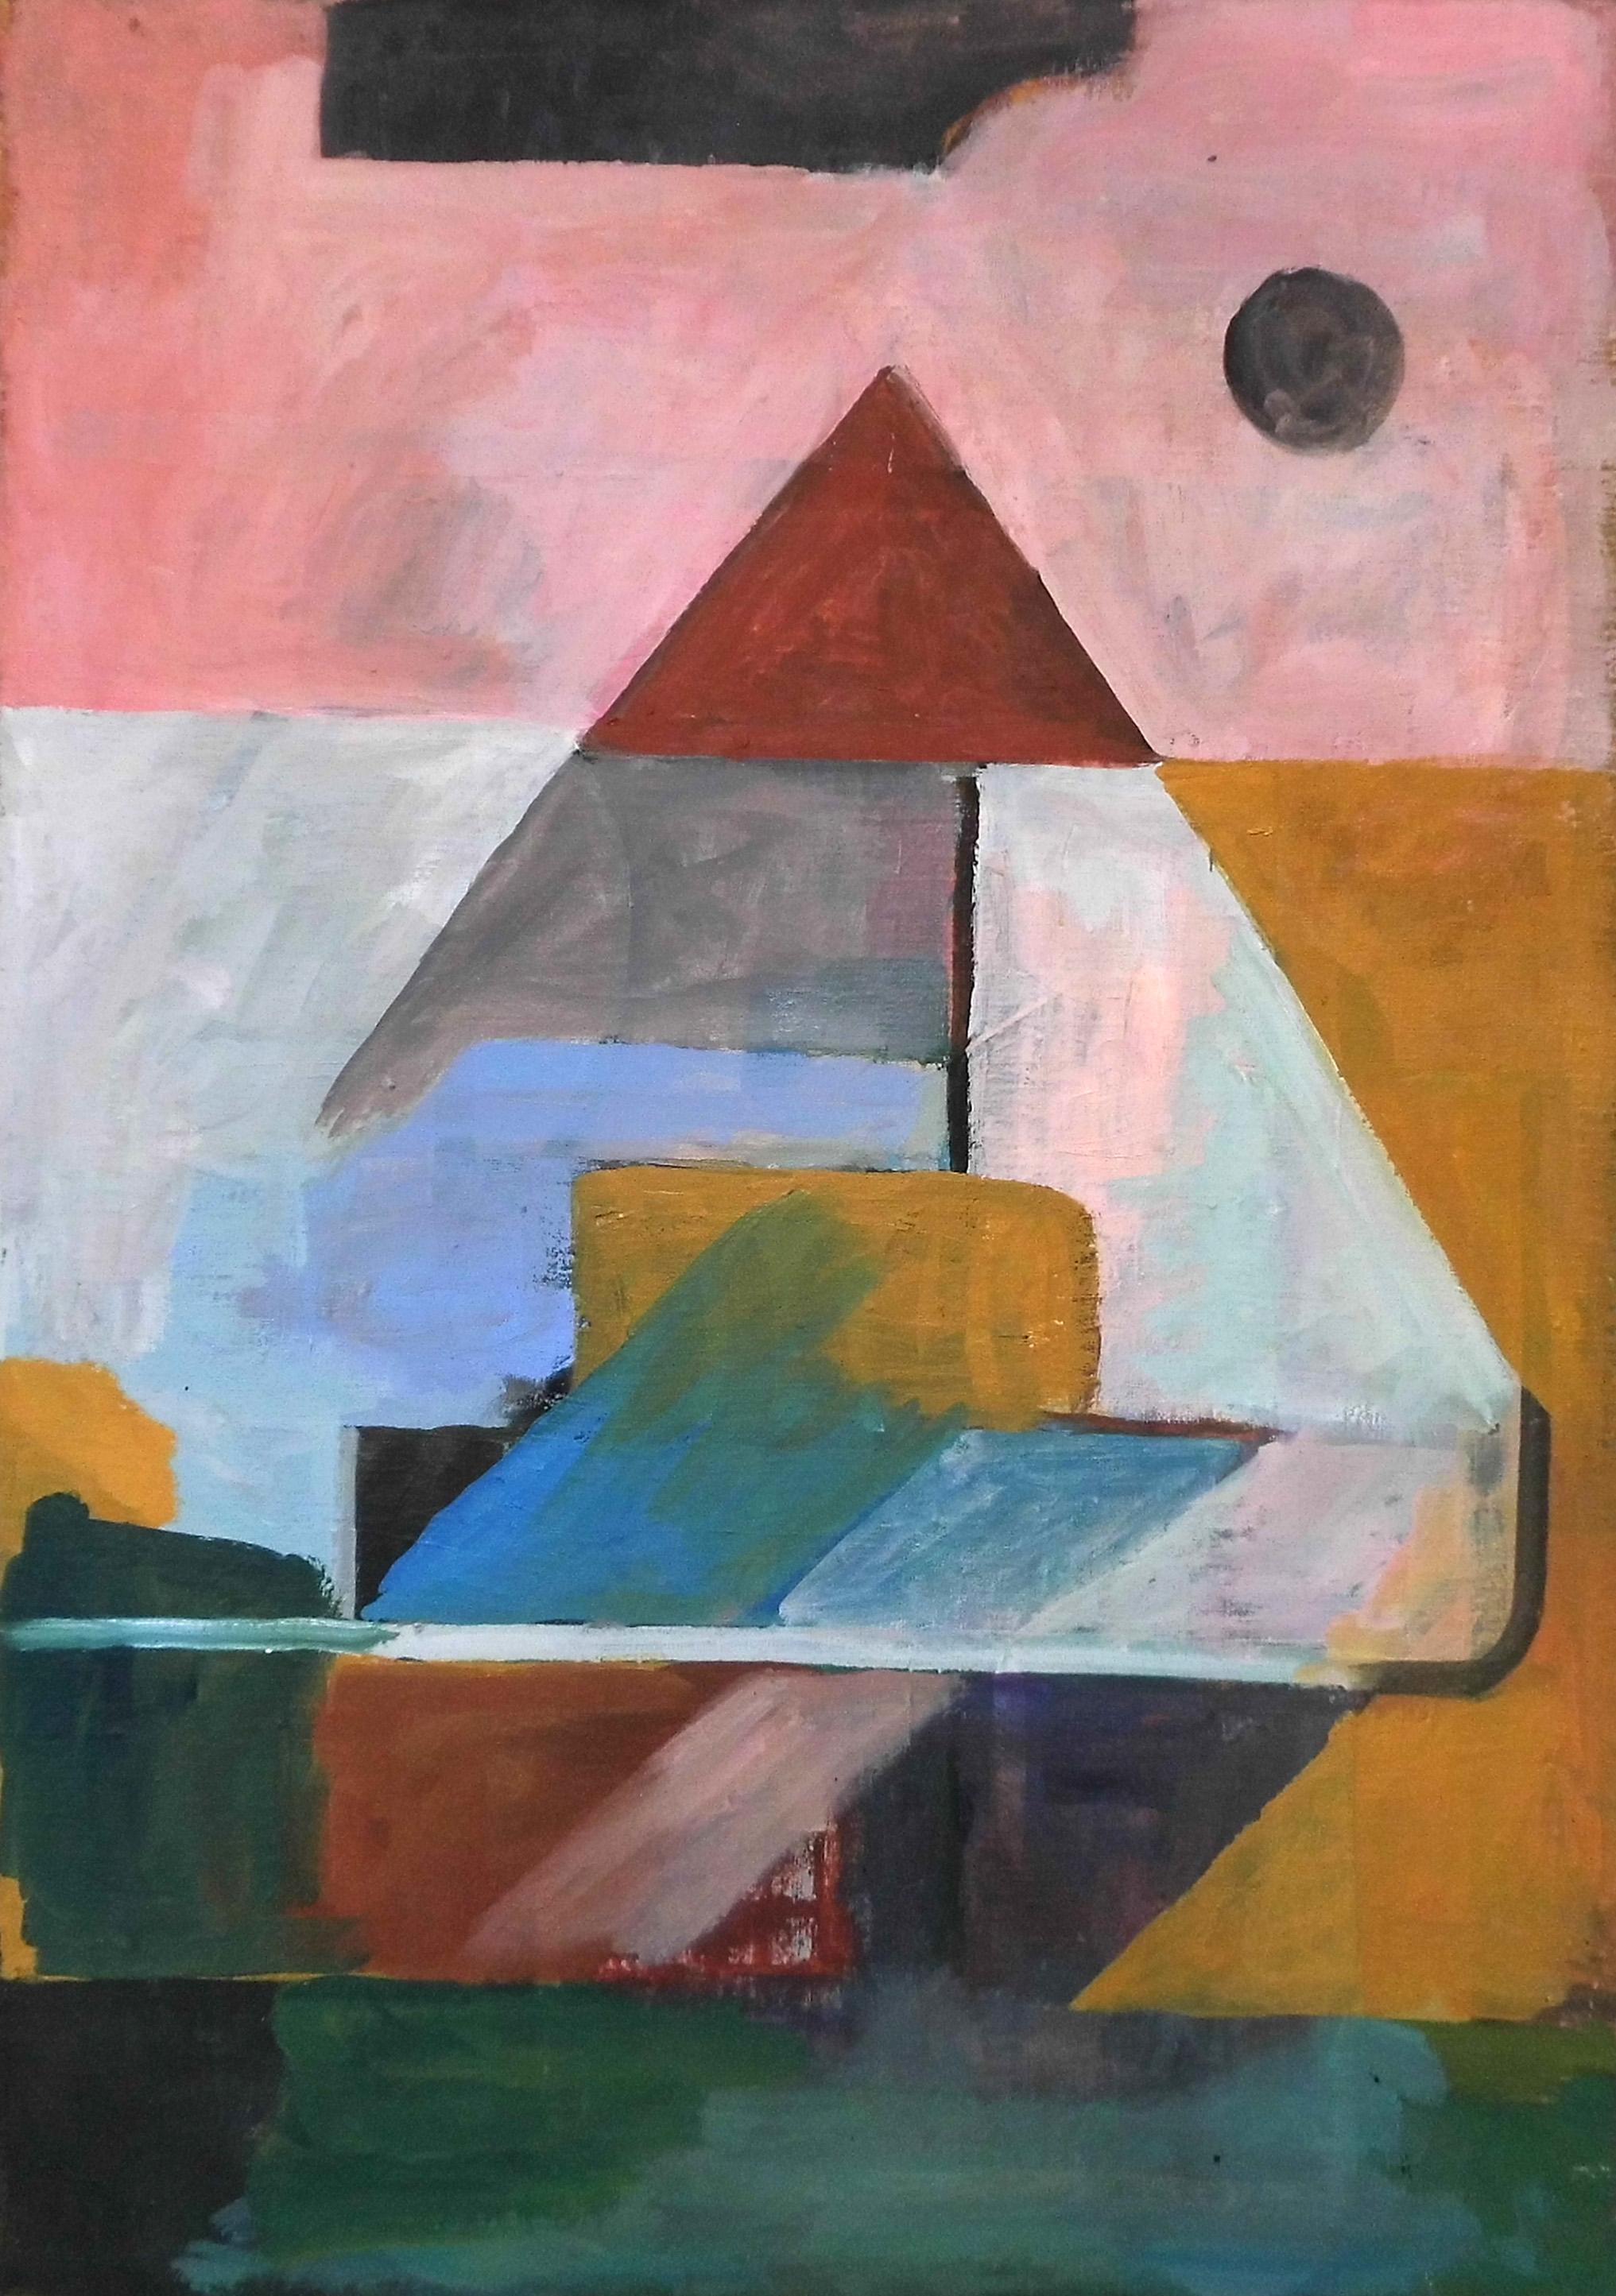 01-wolfgang_leber-schwarzer_mond_pyramide-2000-oel_hartfaser-54x38